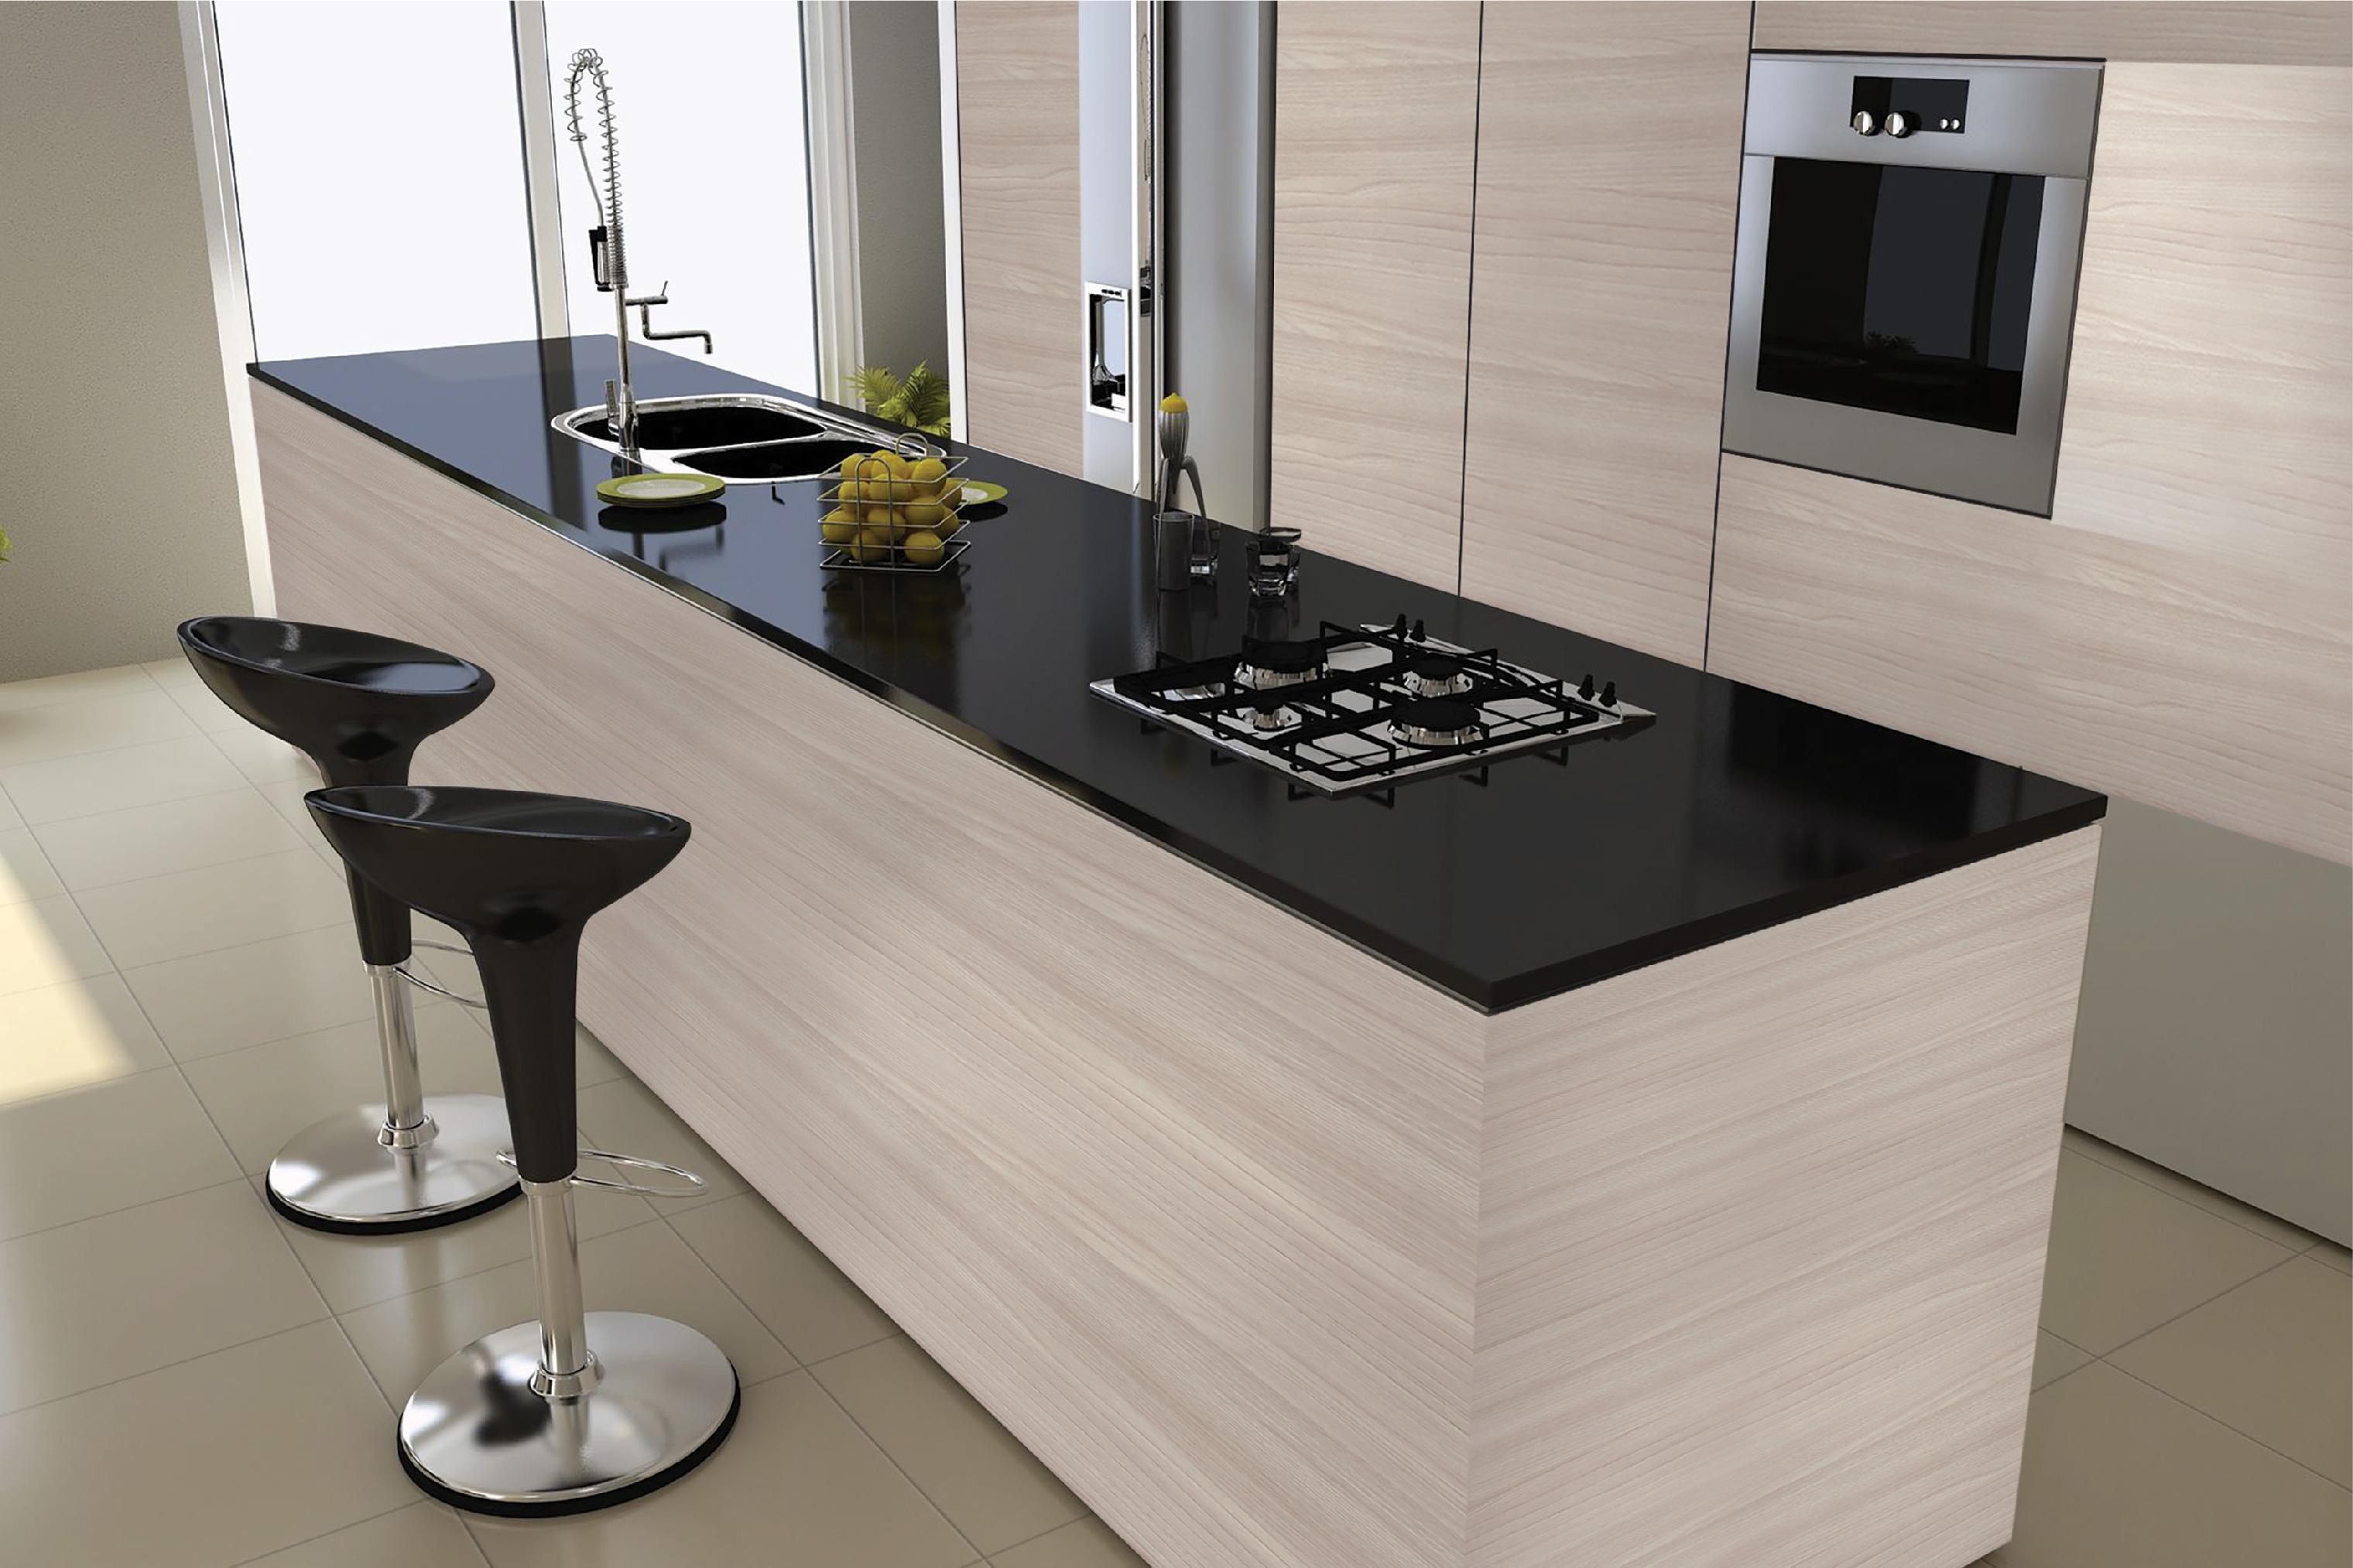 Showcase Modern Kitchen Cabinet Green Decor Melamine Faced